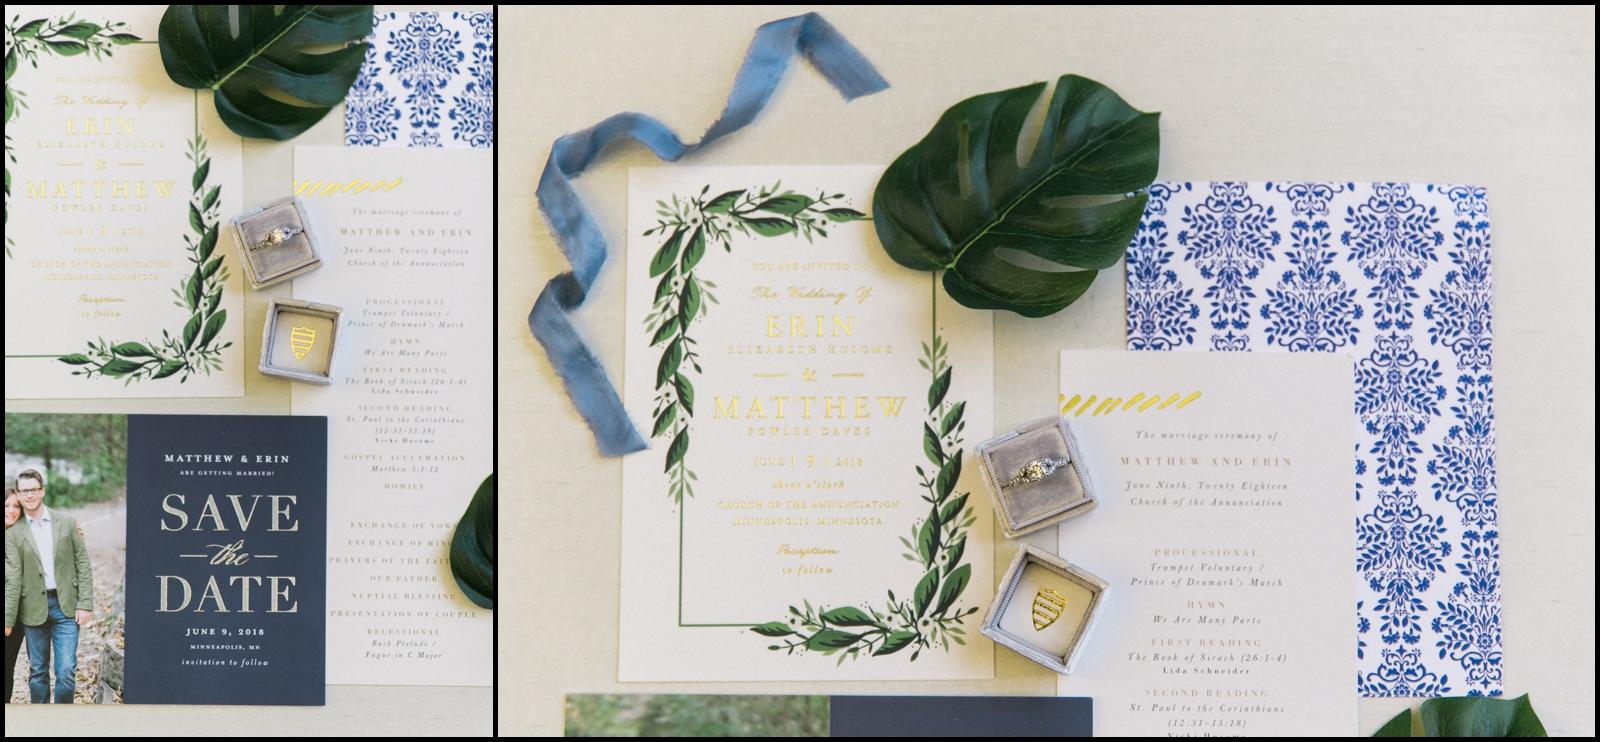 Wedding invitation and wedding rings